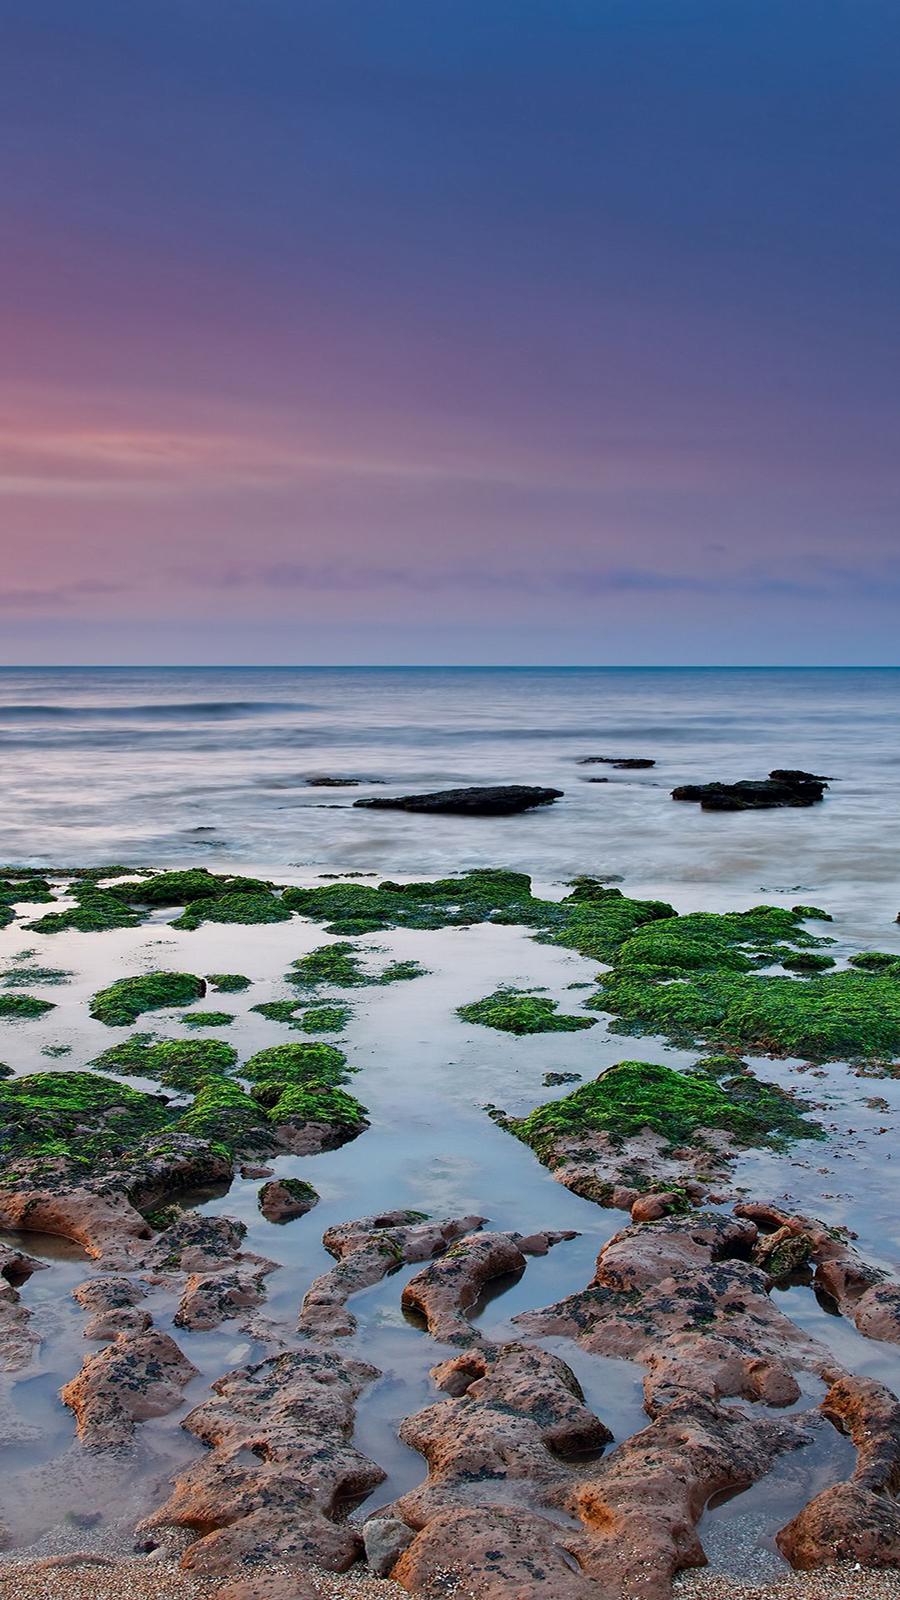 Reefs, Moss, Sea, Rain, Algae Full HD Wallpapers Now Download